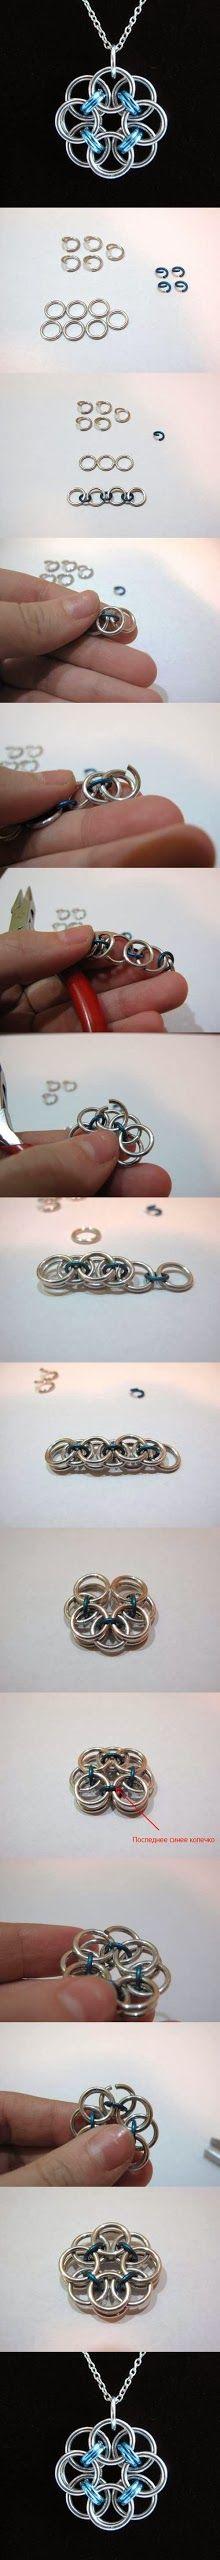 DIY: Pendentif Rose fil | bricolage et artisanat Tutoriels